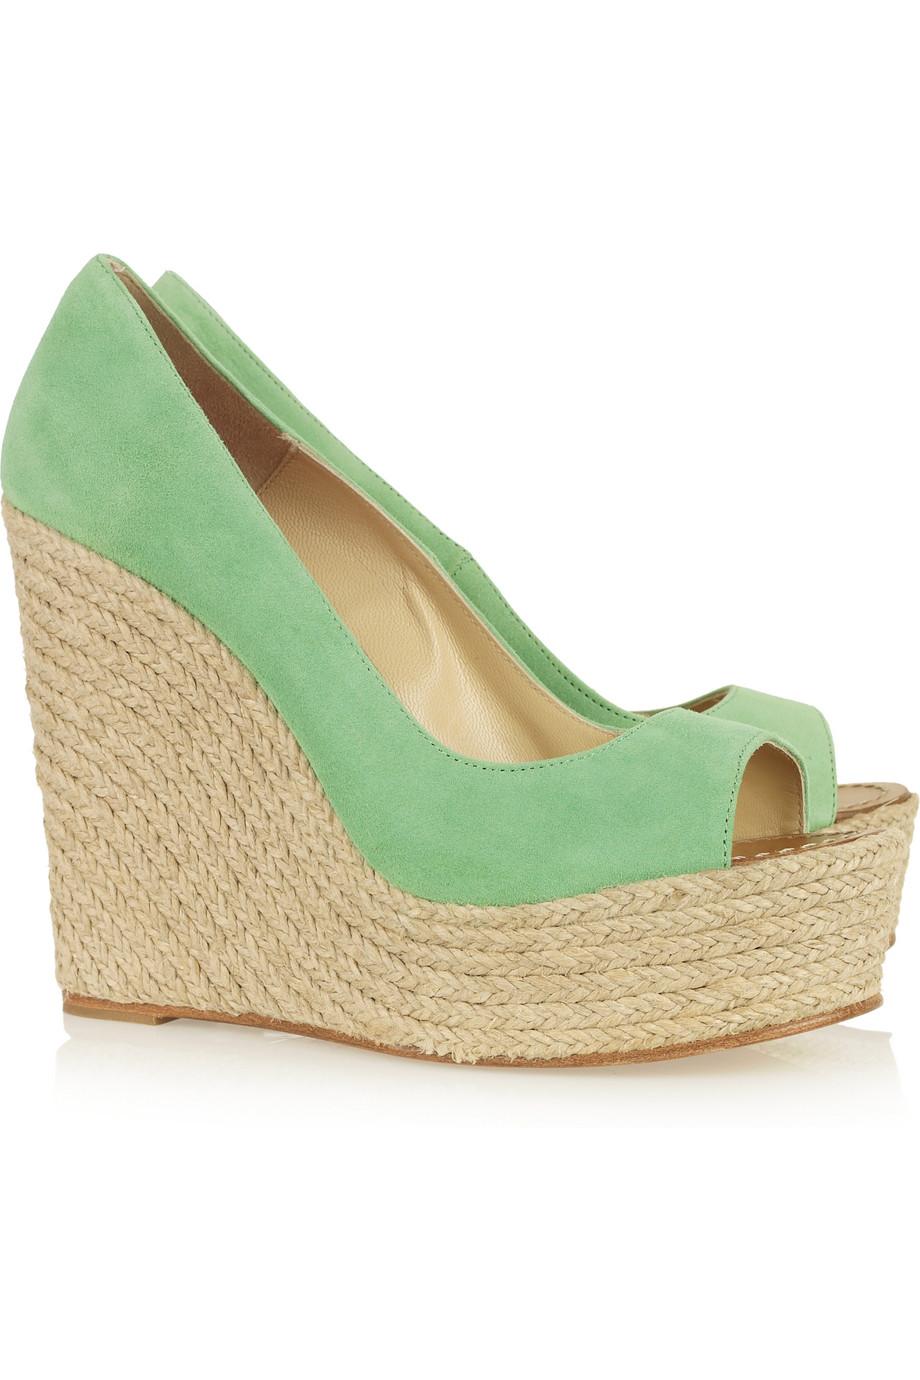 mint green wedge shoes memes